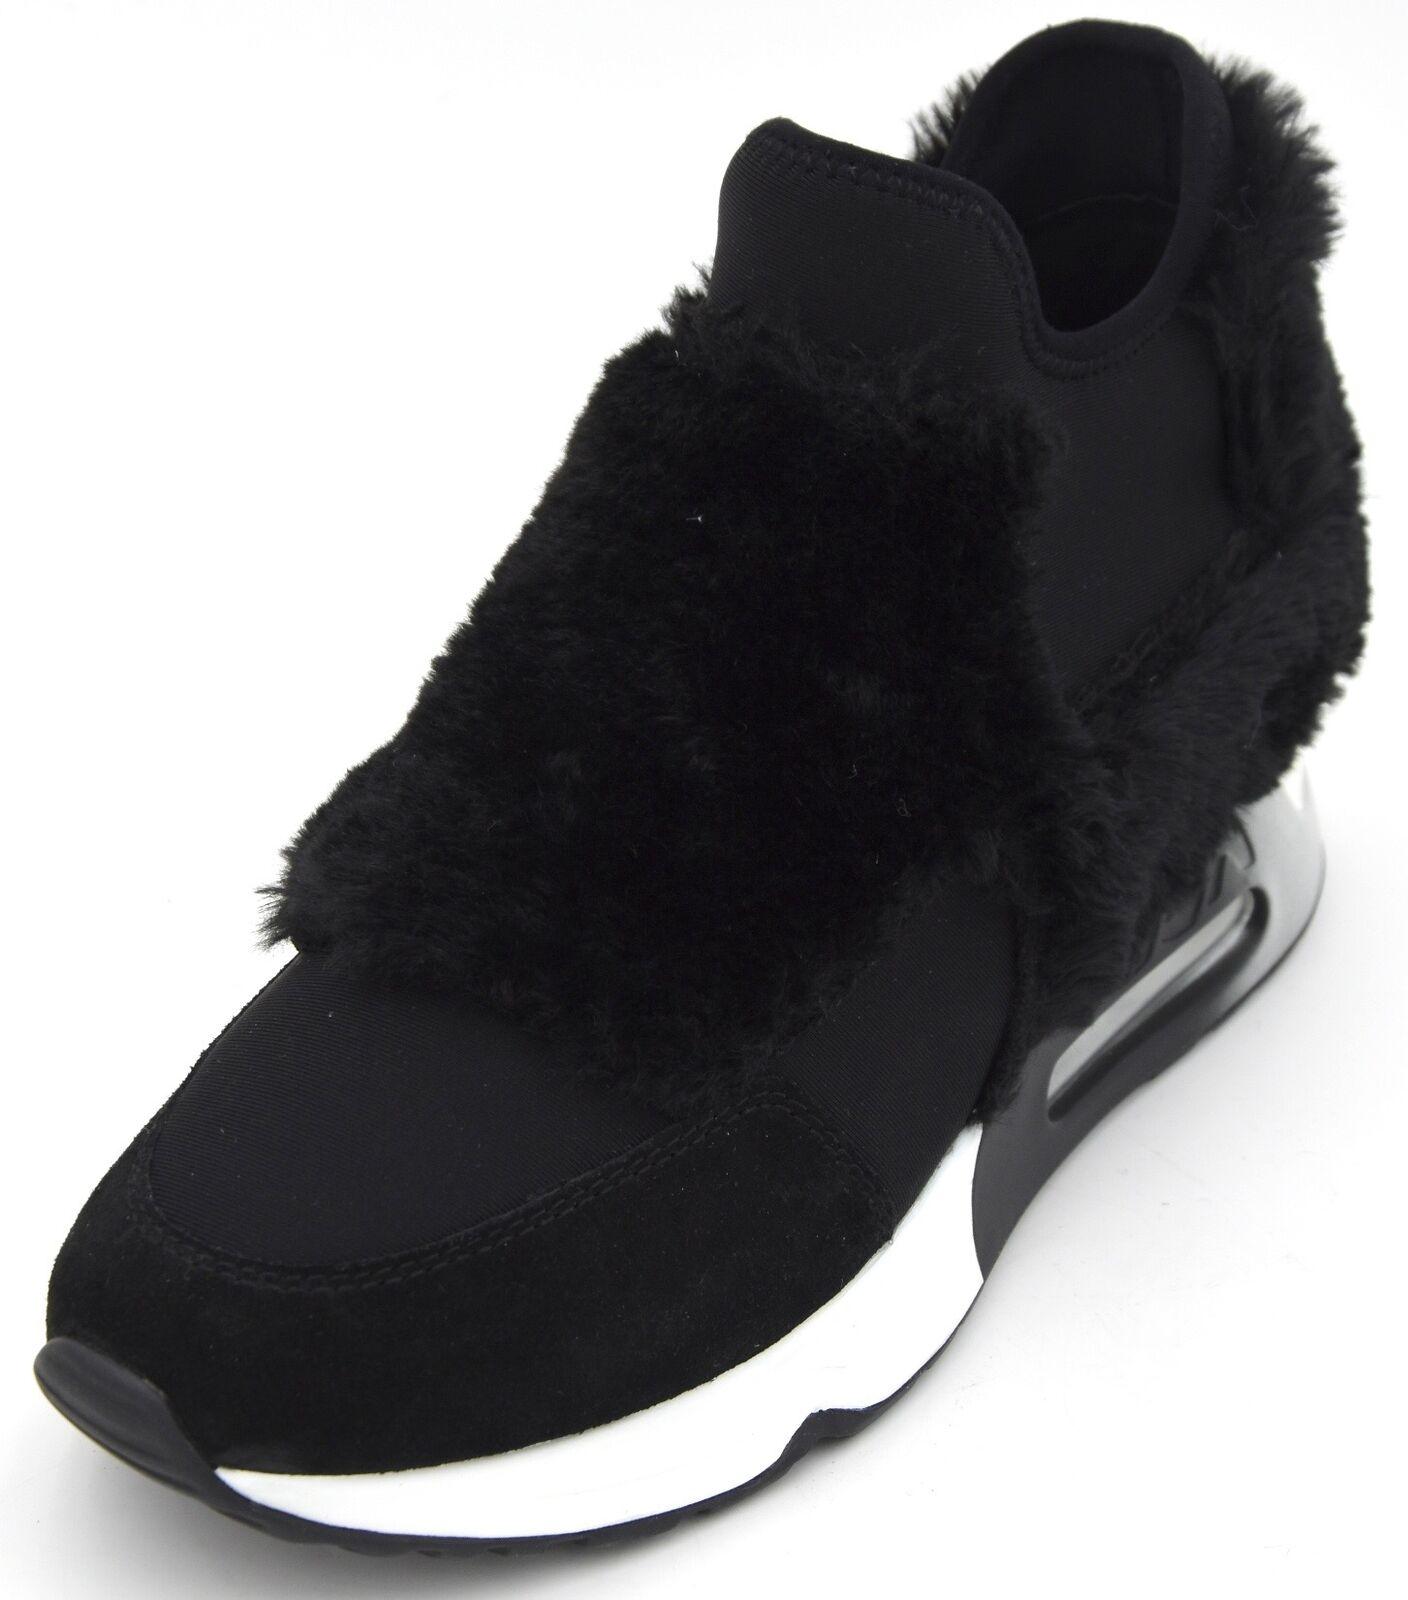 Ash Womens Sneakers Casual shoes Sneaker Casual Lazer Fur FW18-S-127084-001